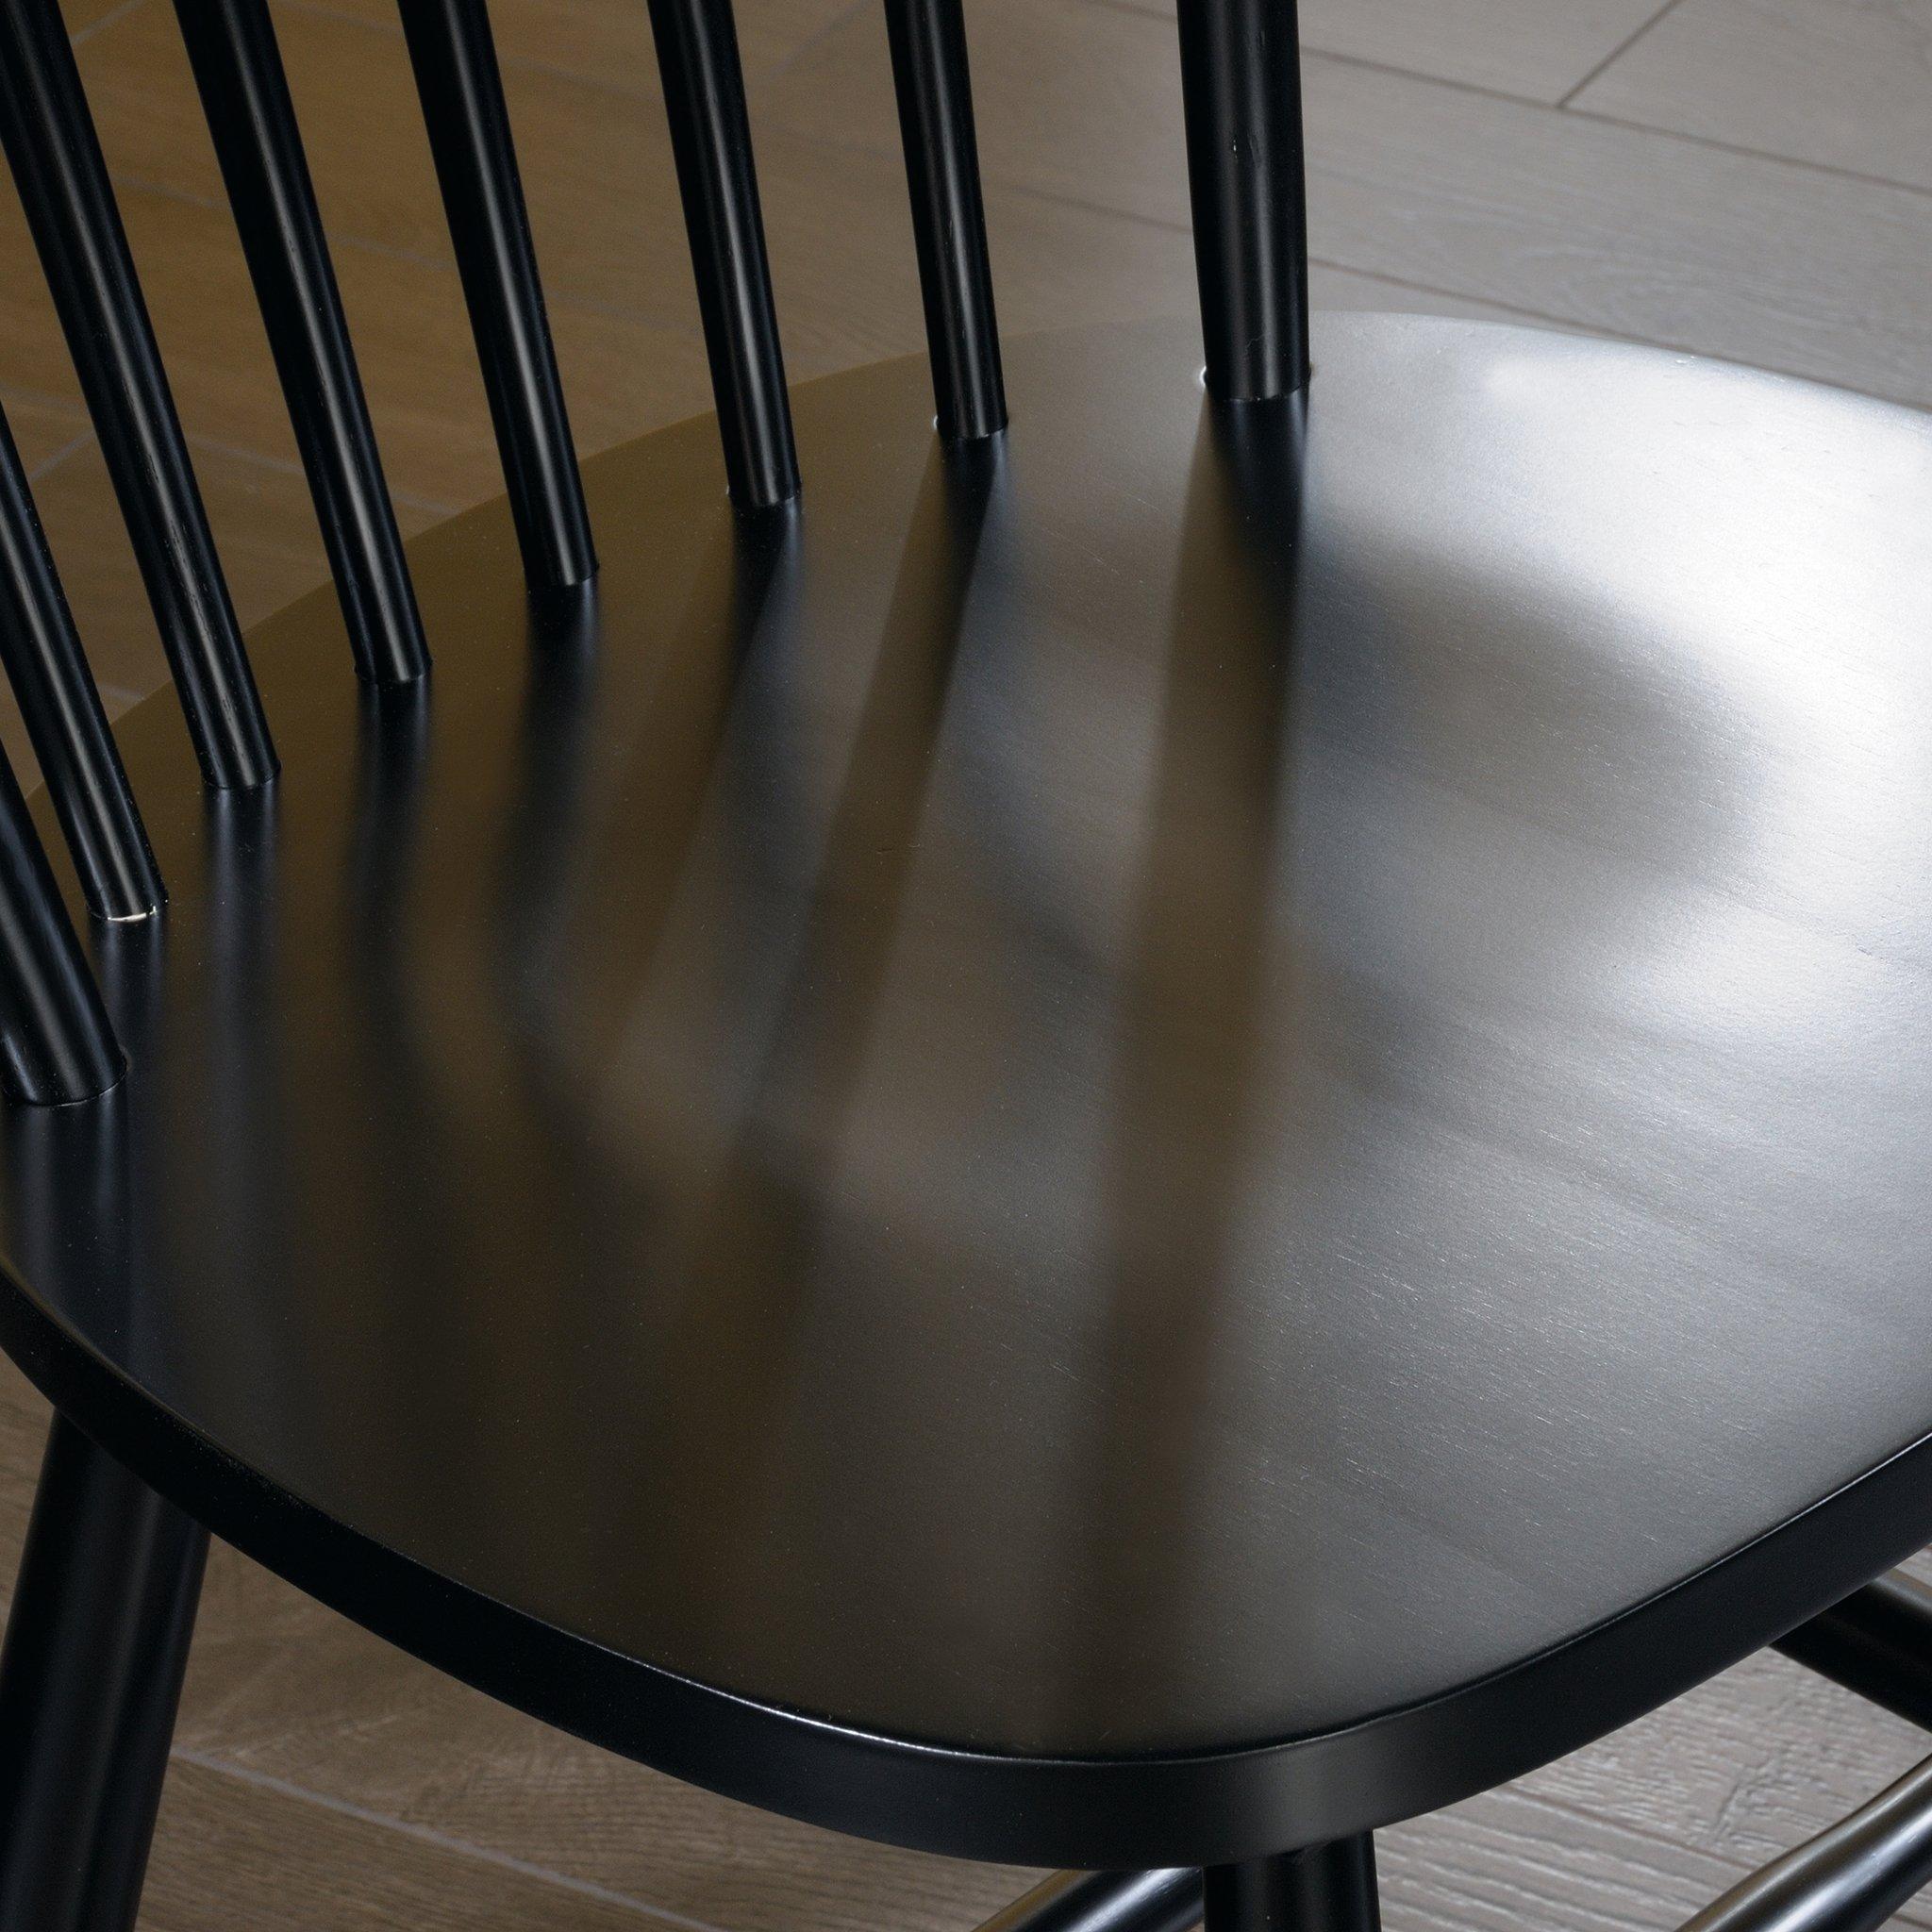 Sauder 418892 New Grange Spindle Back Chairs, L: 20.47'' x W: 21.26'' x H: 36.22'', Black finish by Sauder (Image #5)